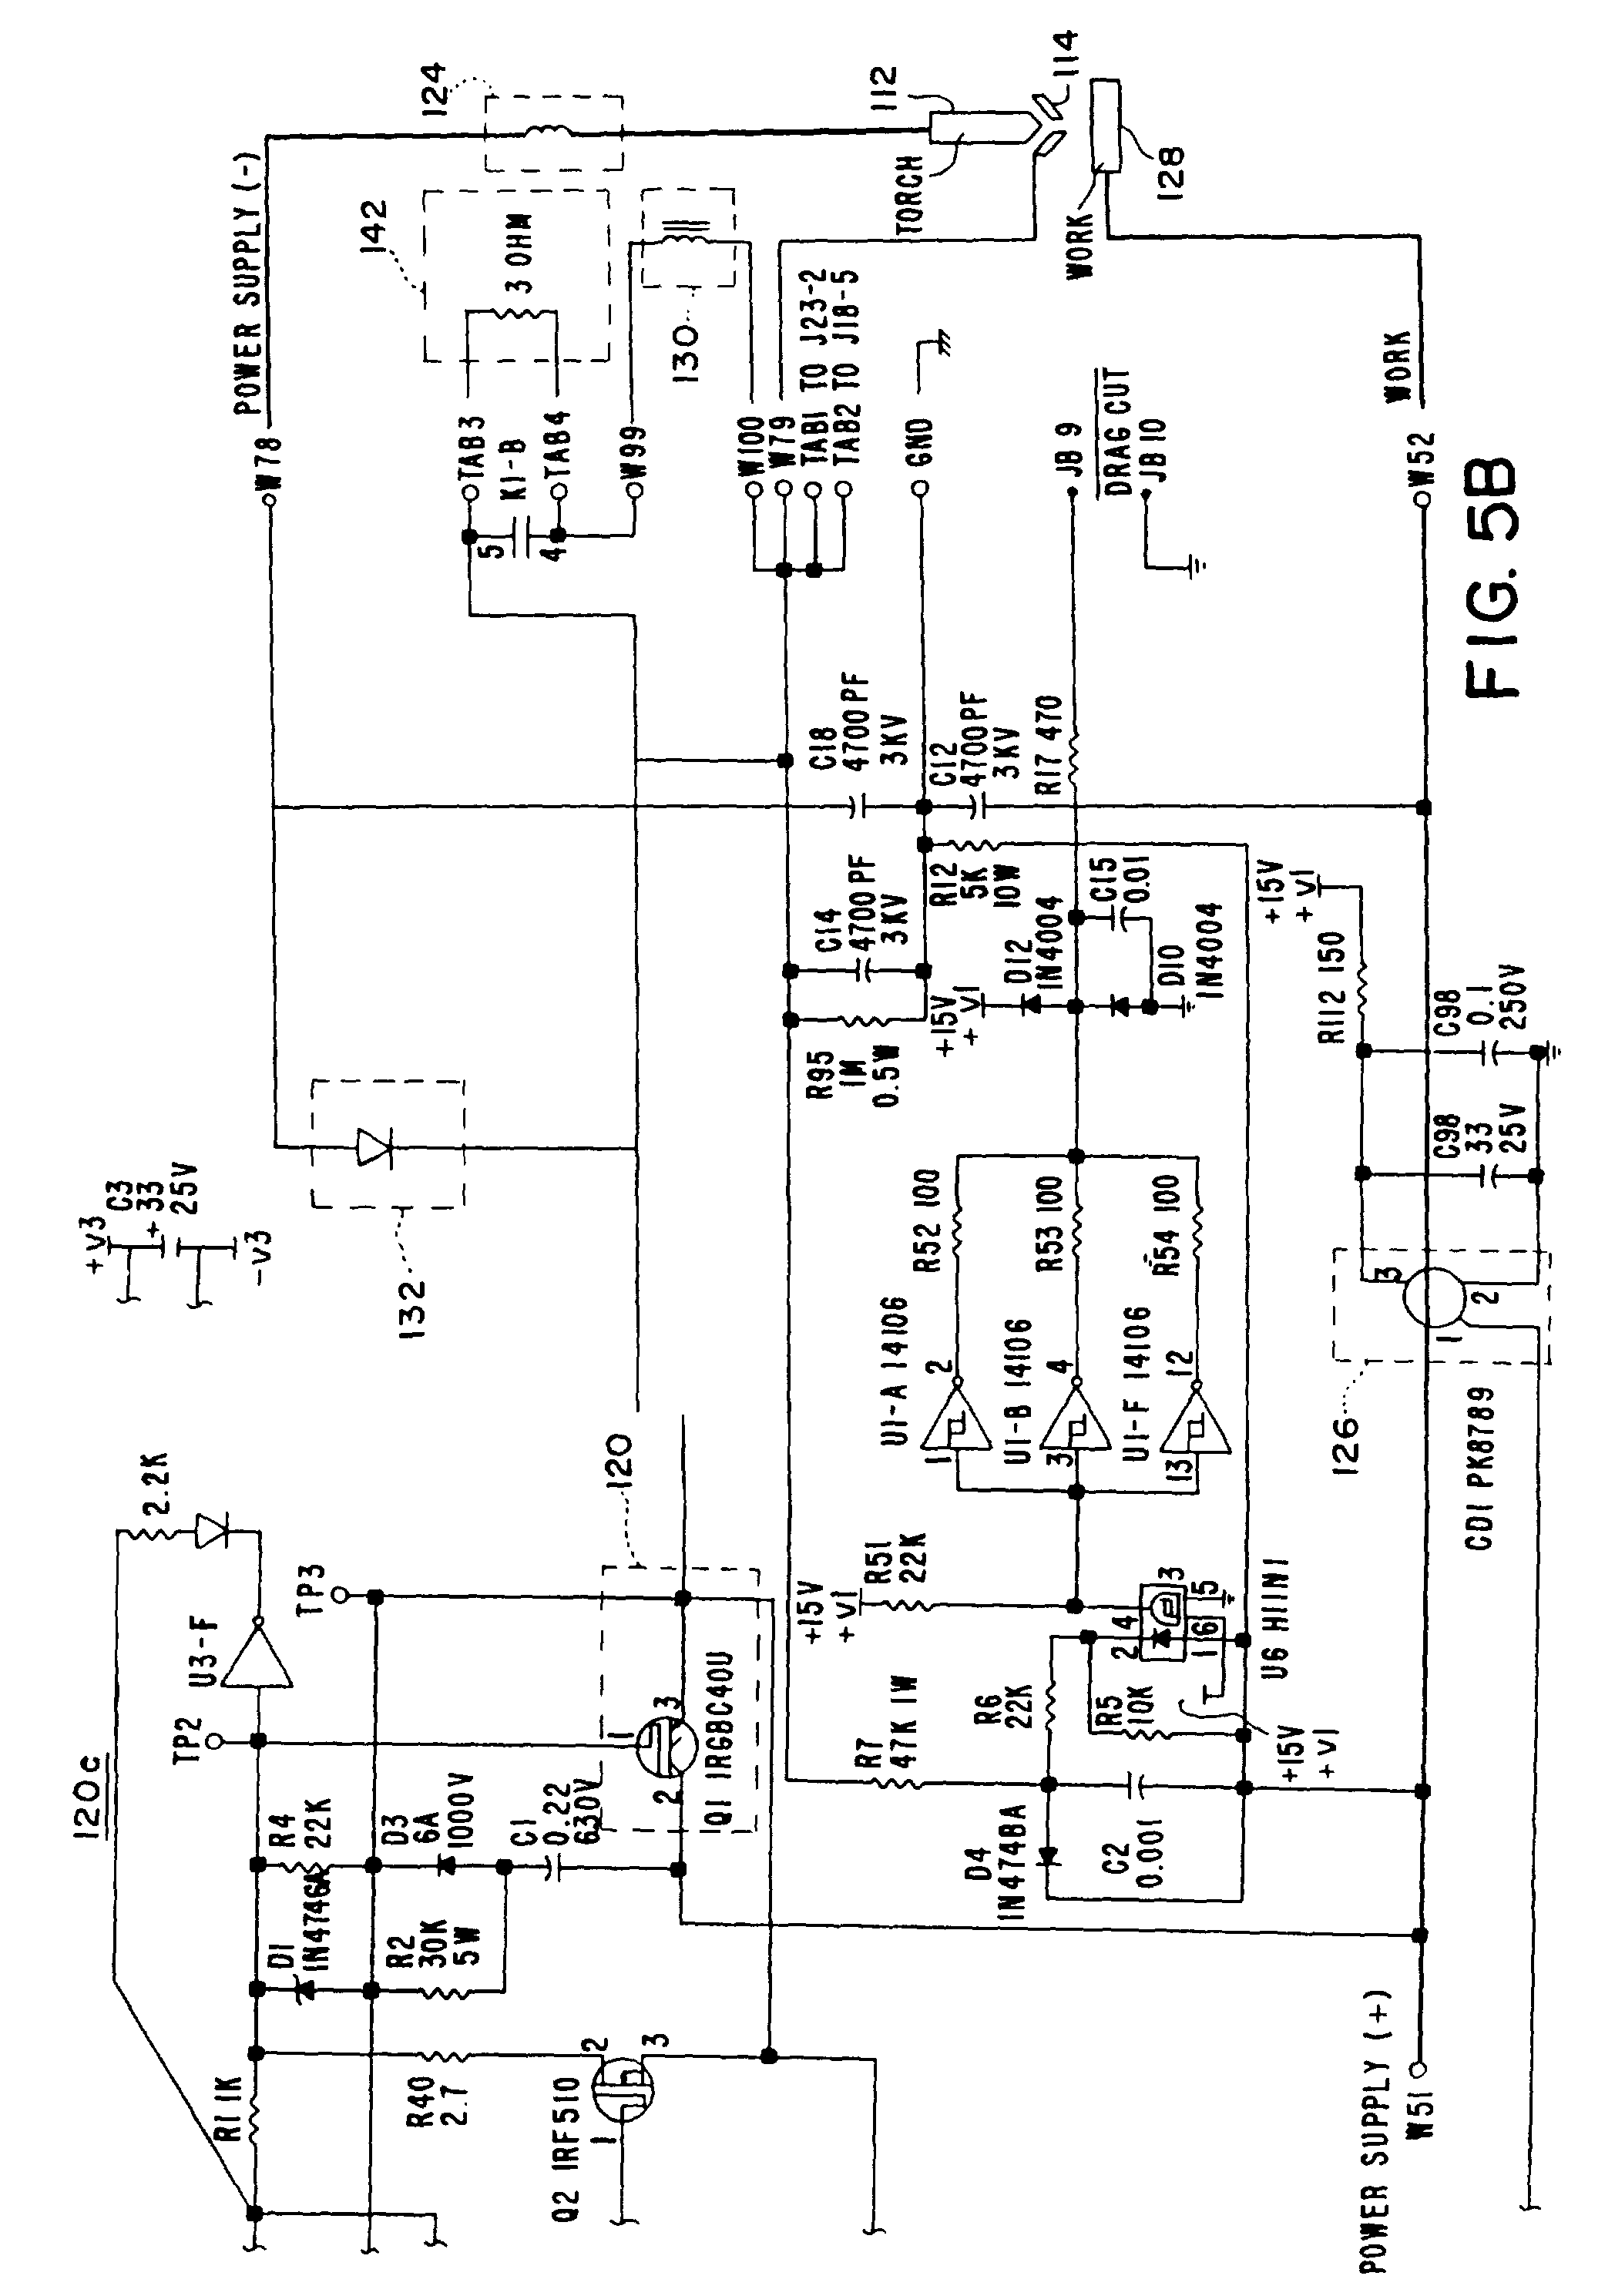 patent ep0604553b1